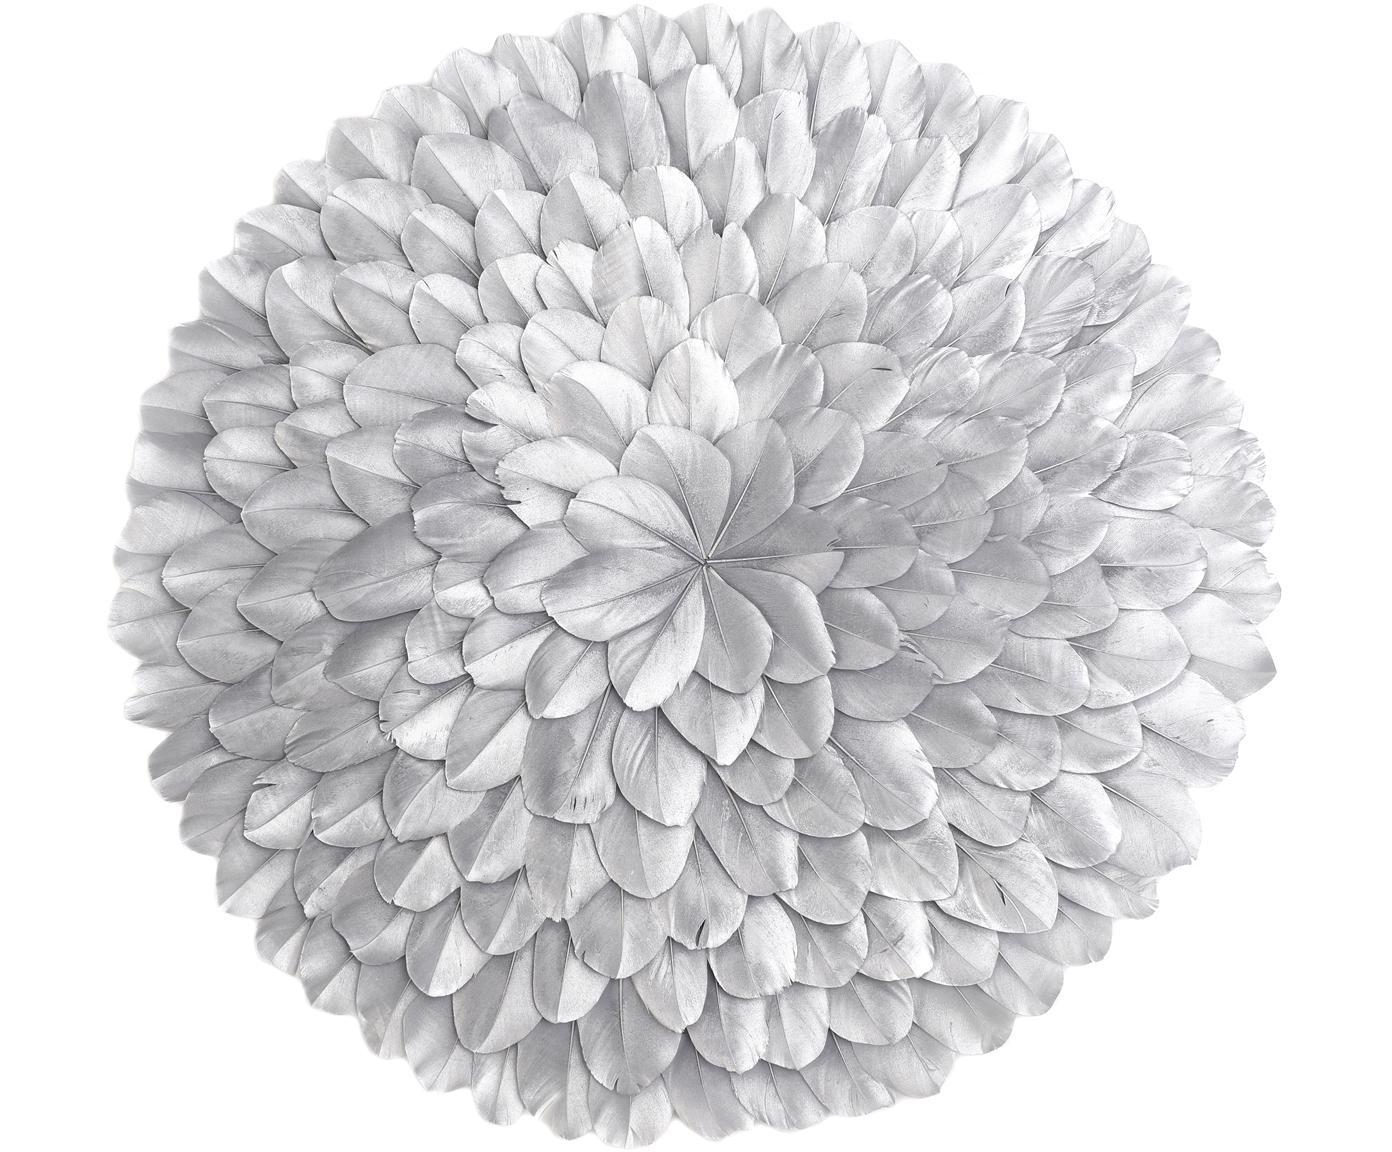 XL Wandobjekt Juju, Federn, gefärbt, Silberfarben, Ø 40 x T 5 cm